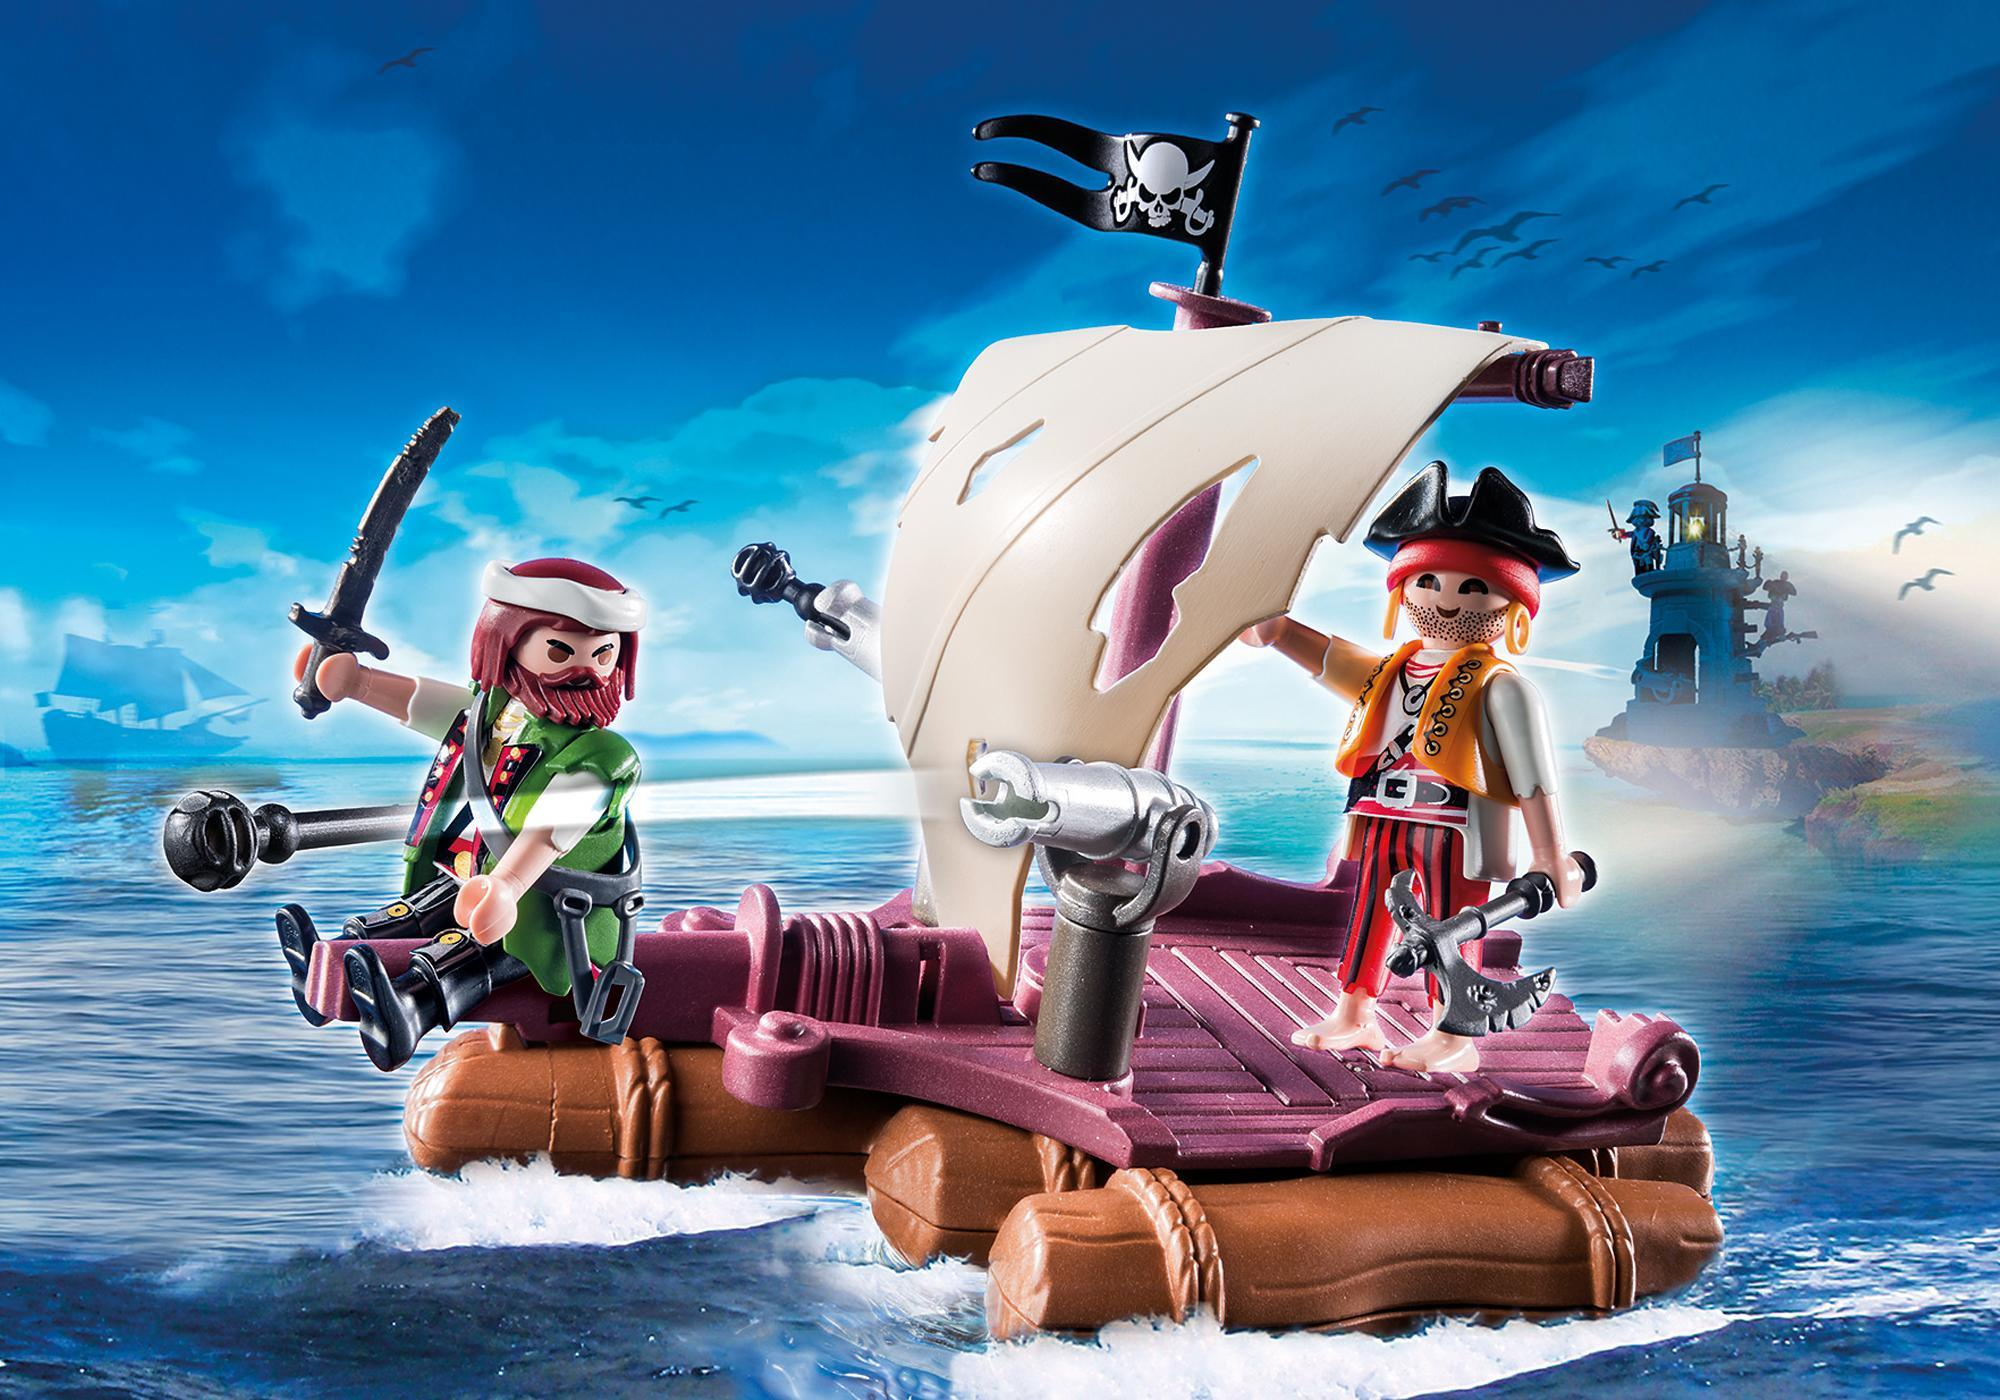 http://media.playmobil.com/i/playmobil/6682_product_detail/Pirate Raft